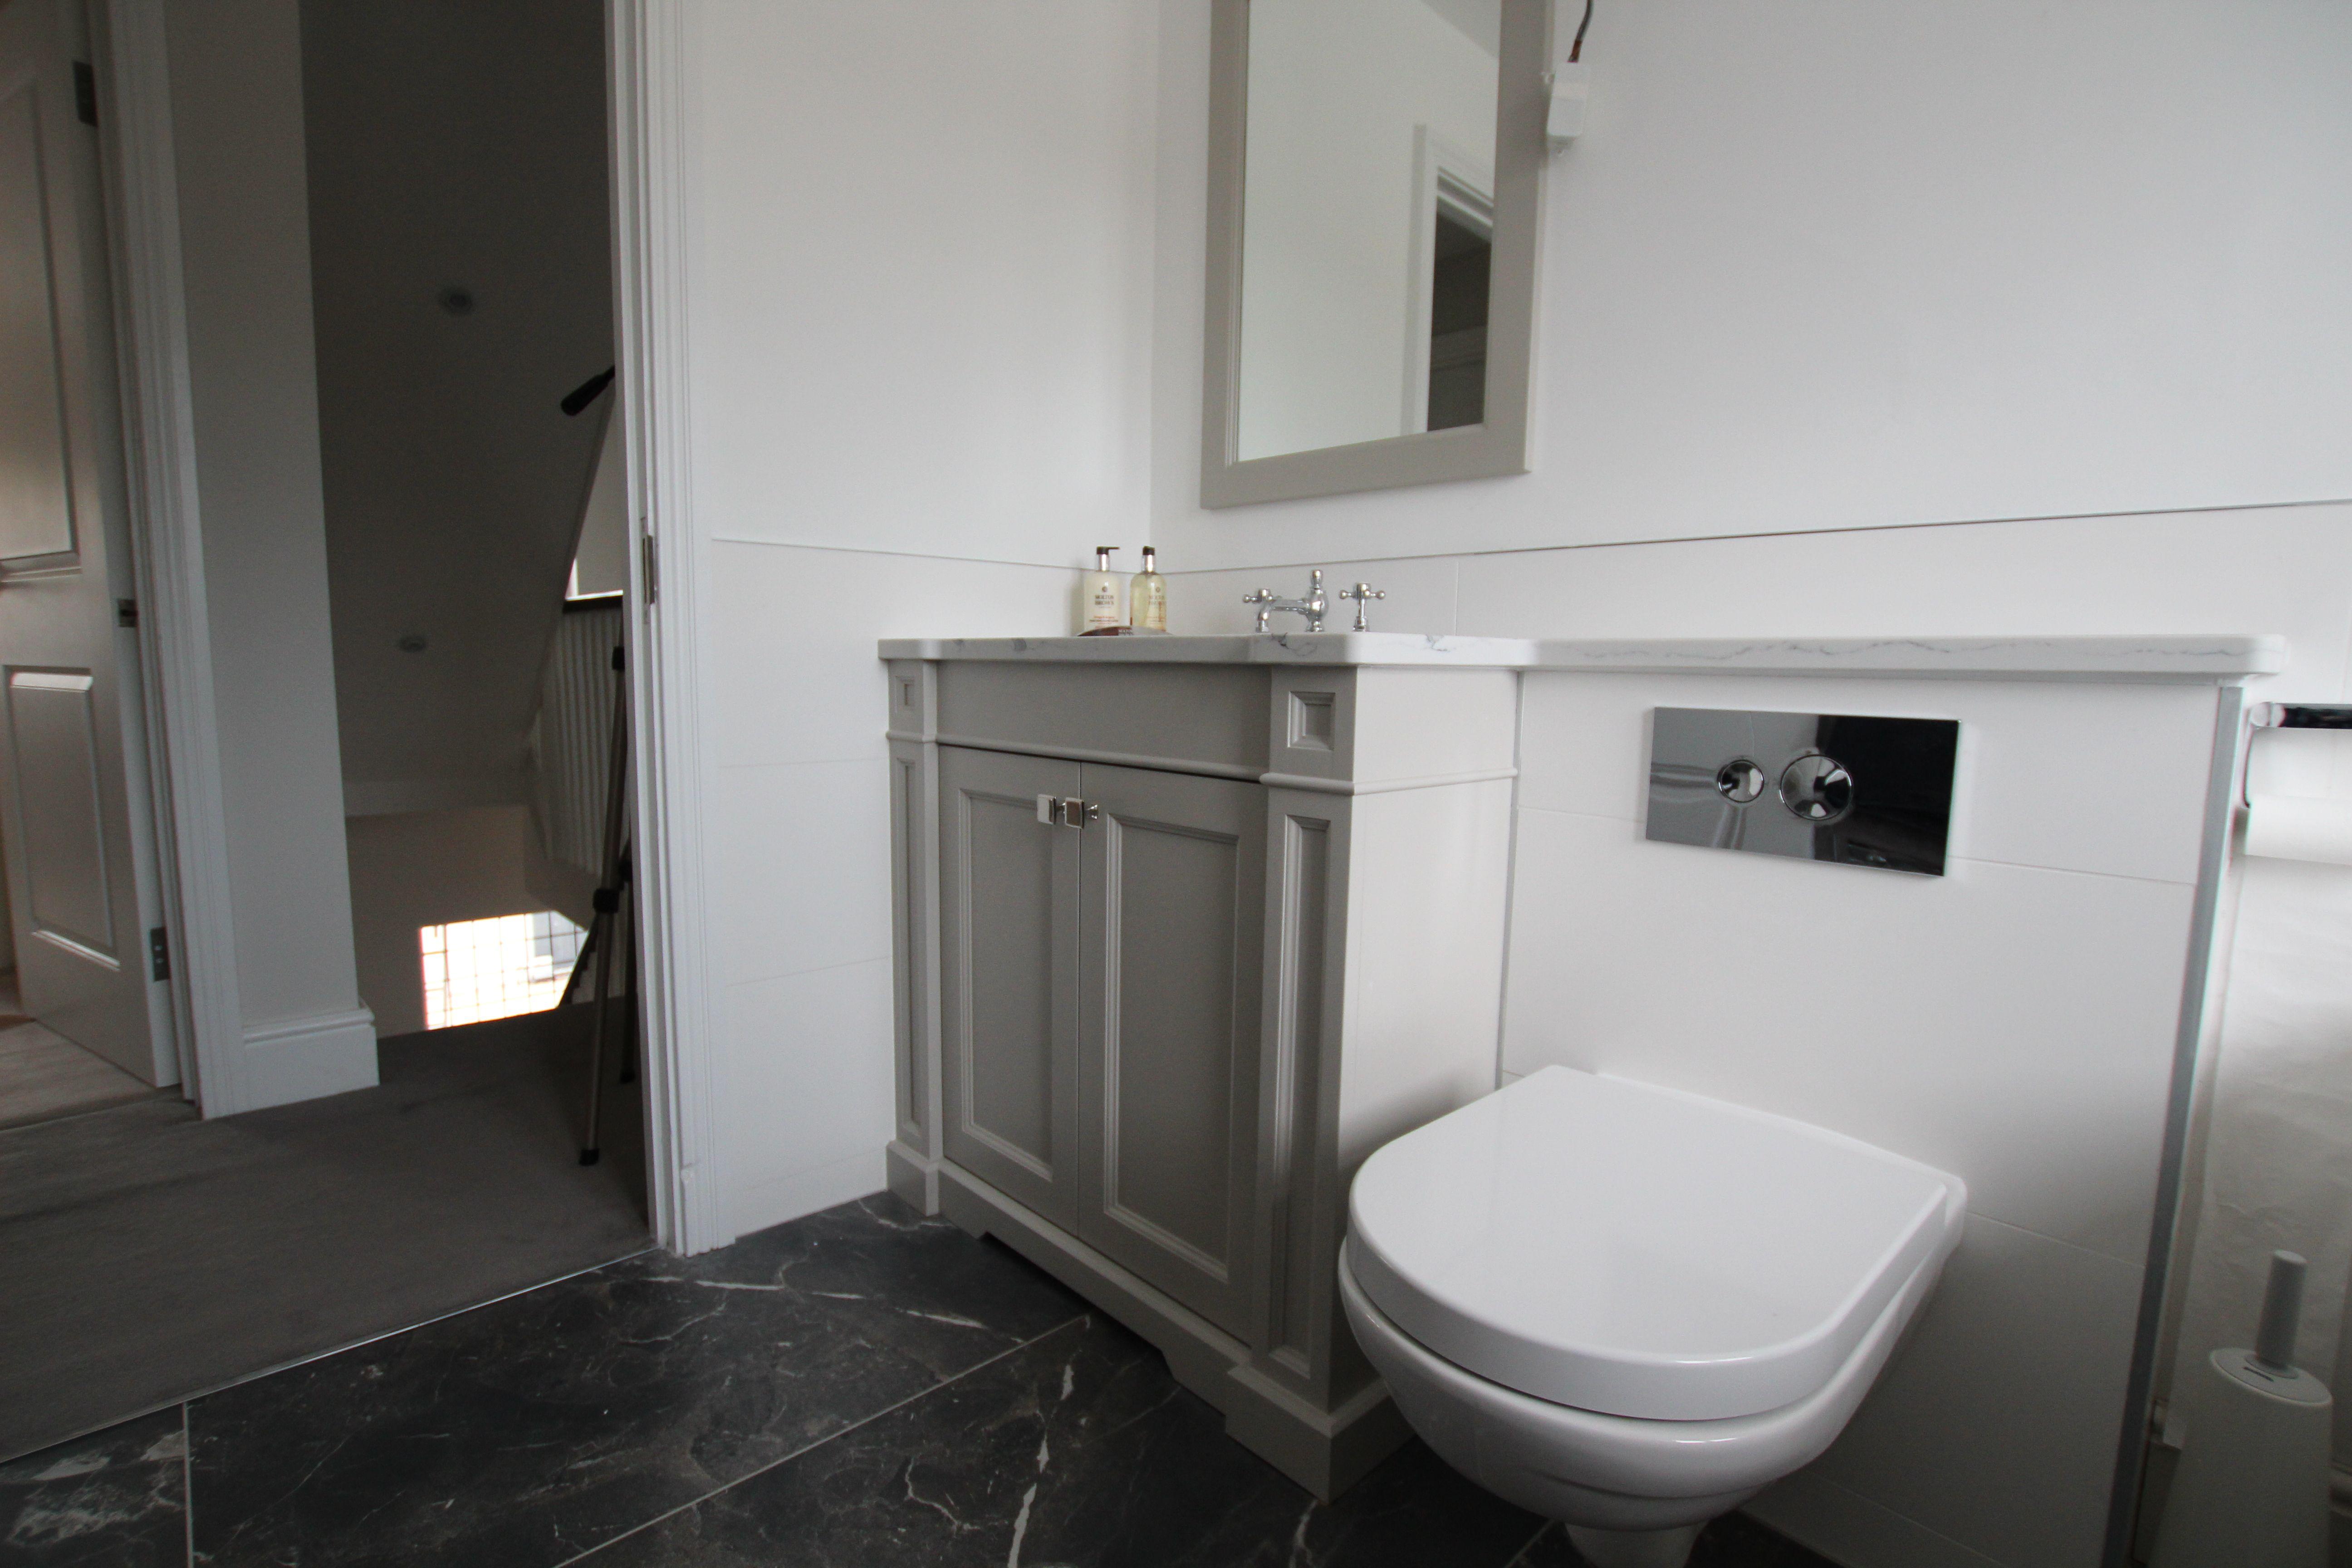 Main bathroom vanity unit traditional style shaker doors vanity